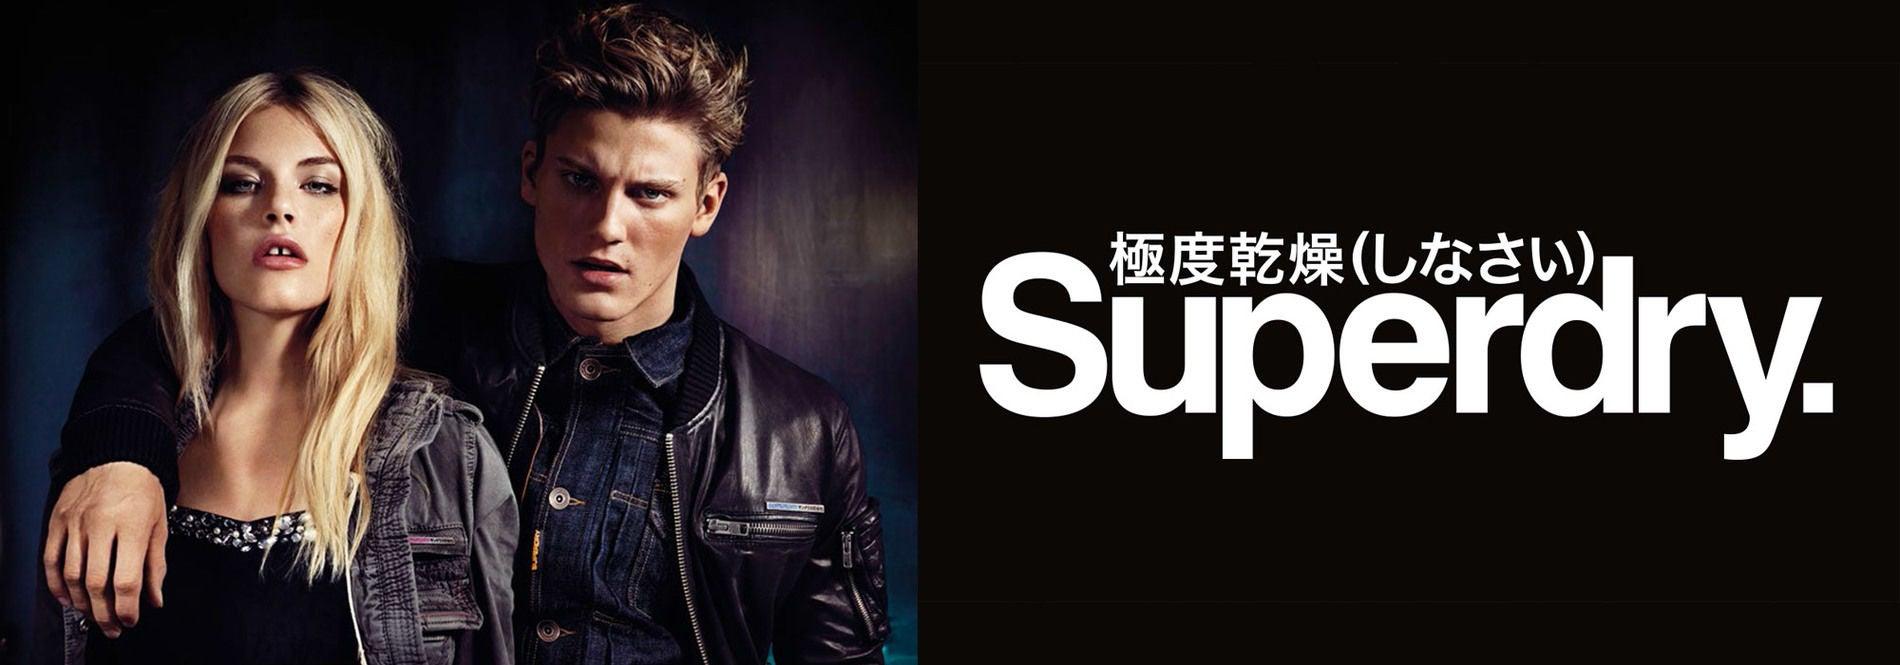 codigo promocional superdry